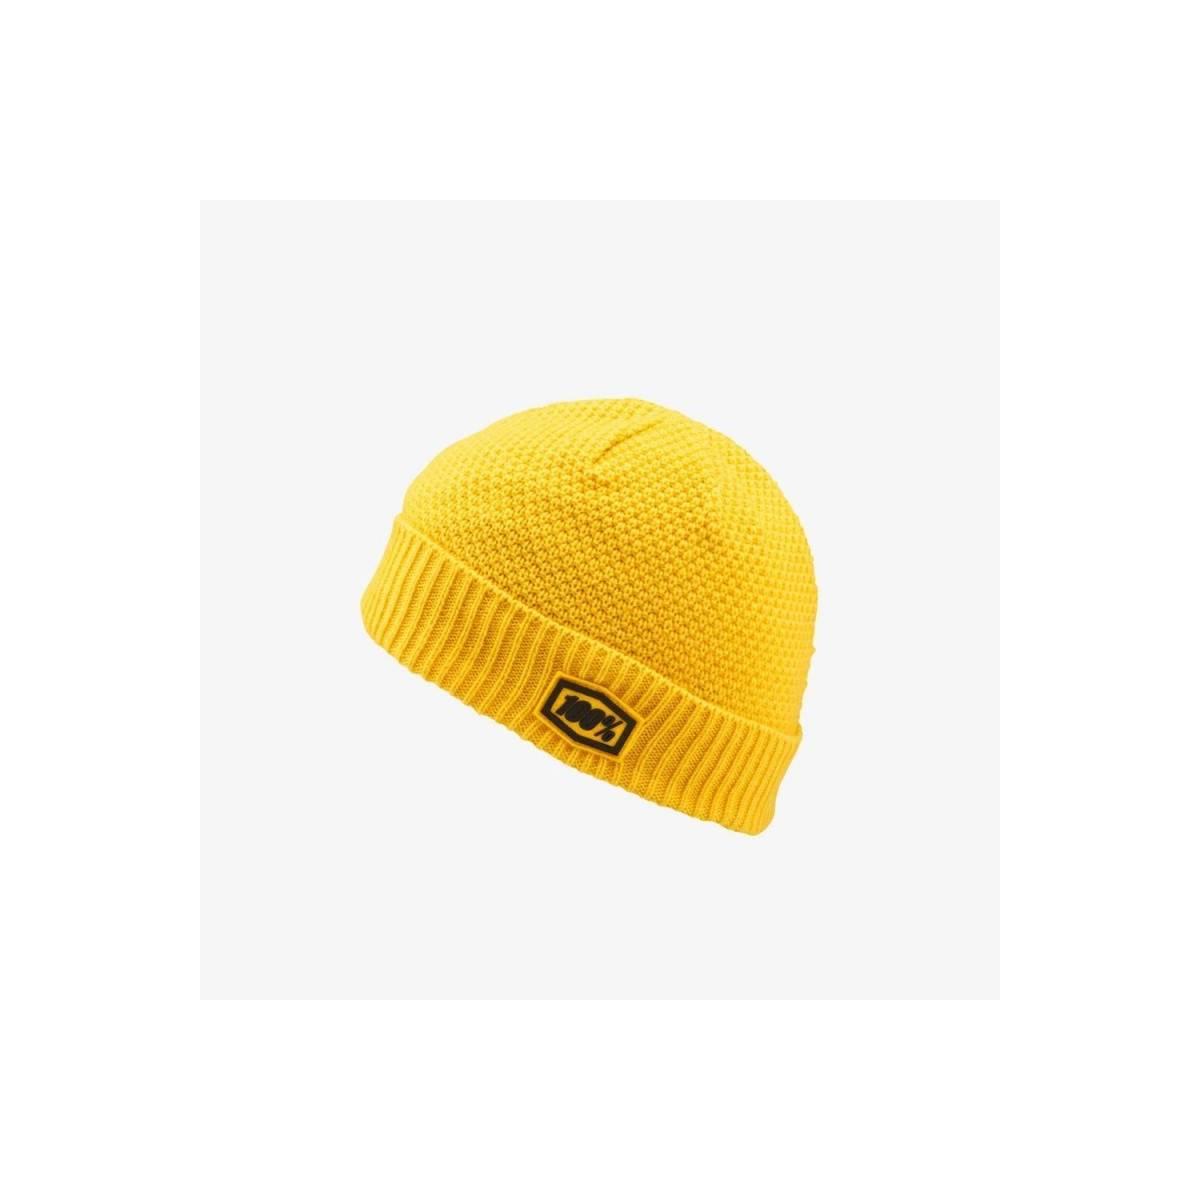 20119.213 - Gorro 100% Capital Mustard